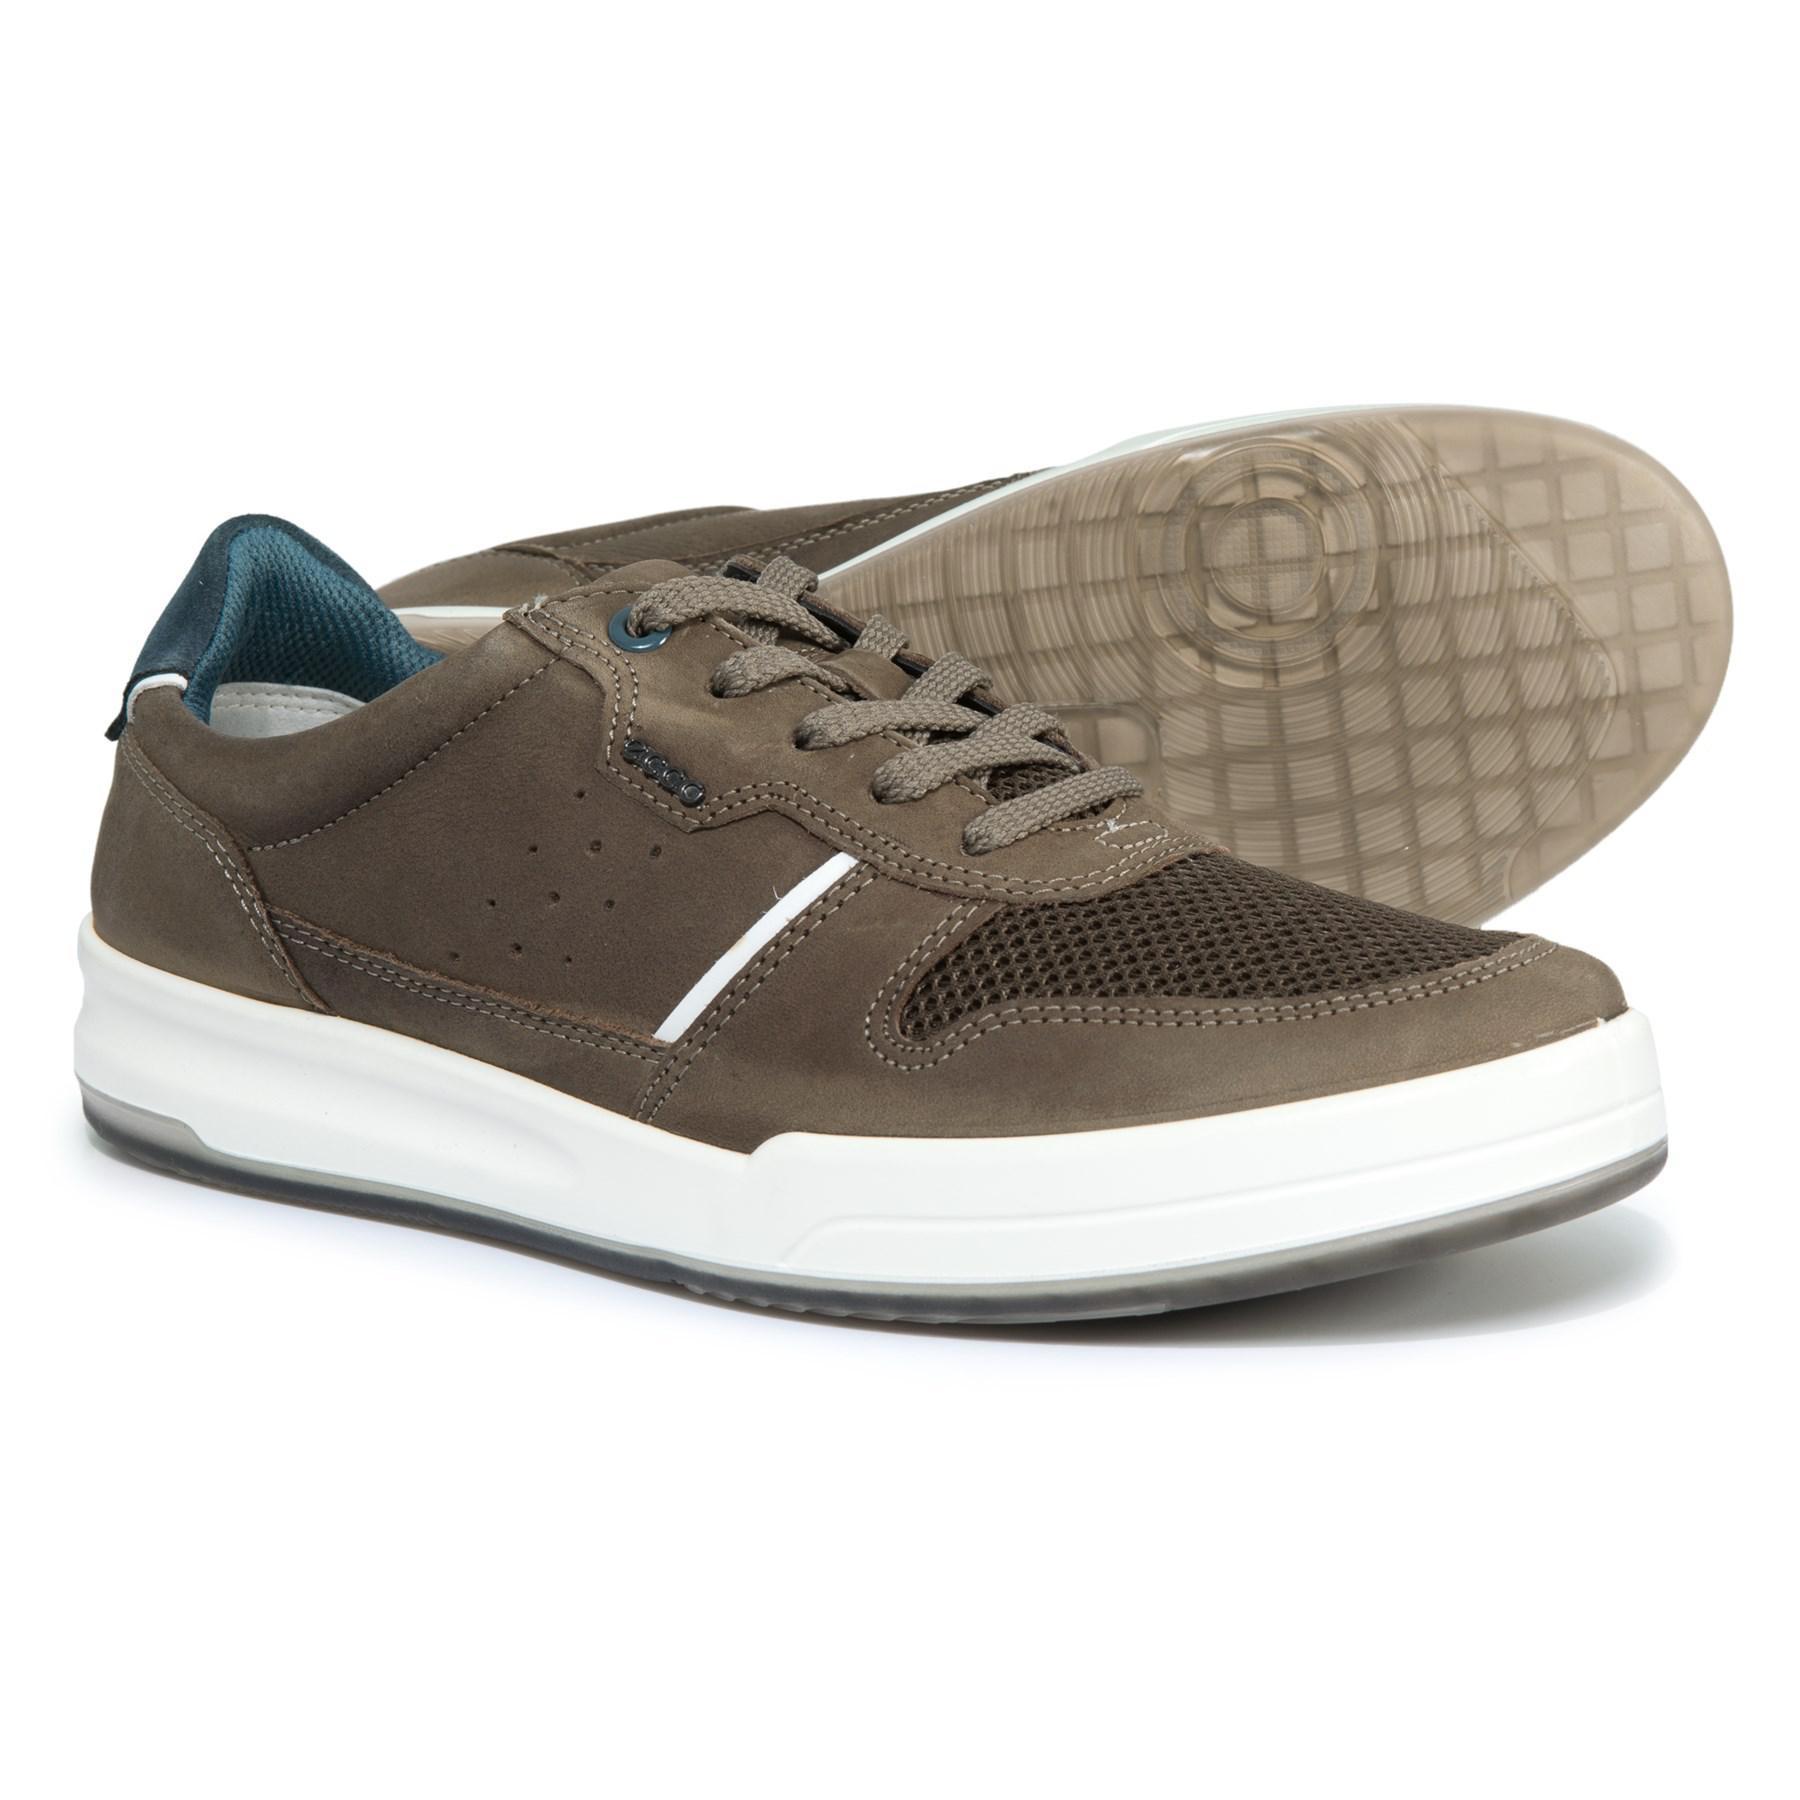 c93289fcfdda Lyst - Ecco Jack Sneakers for Men